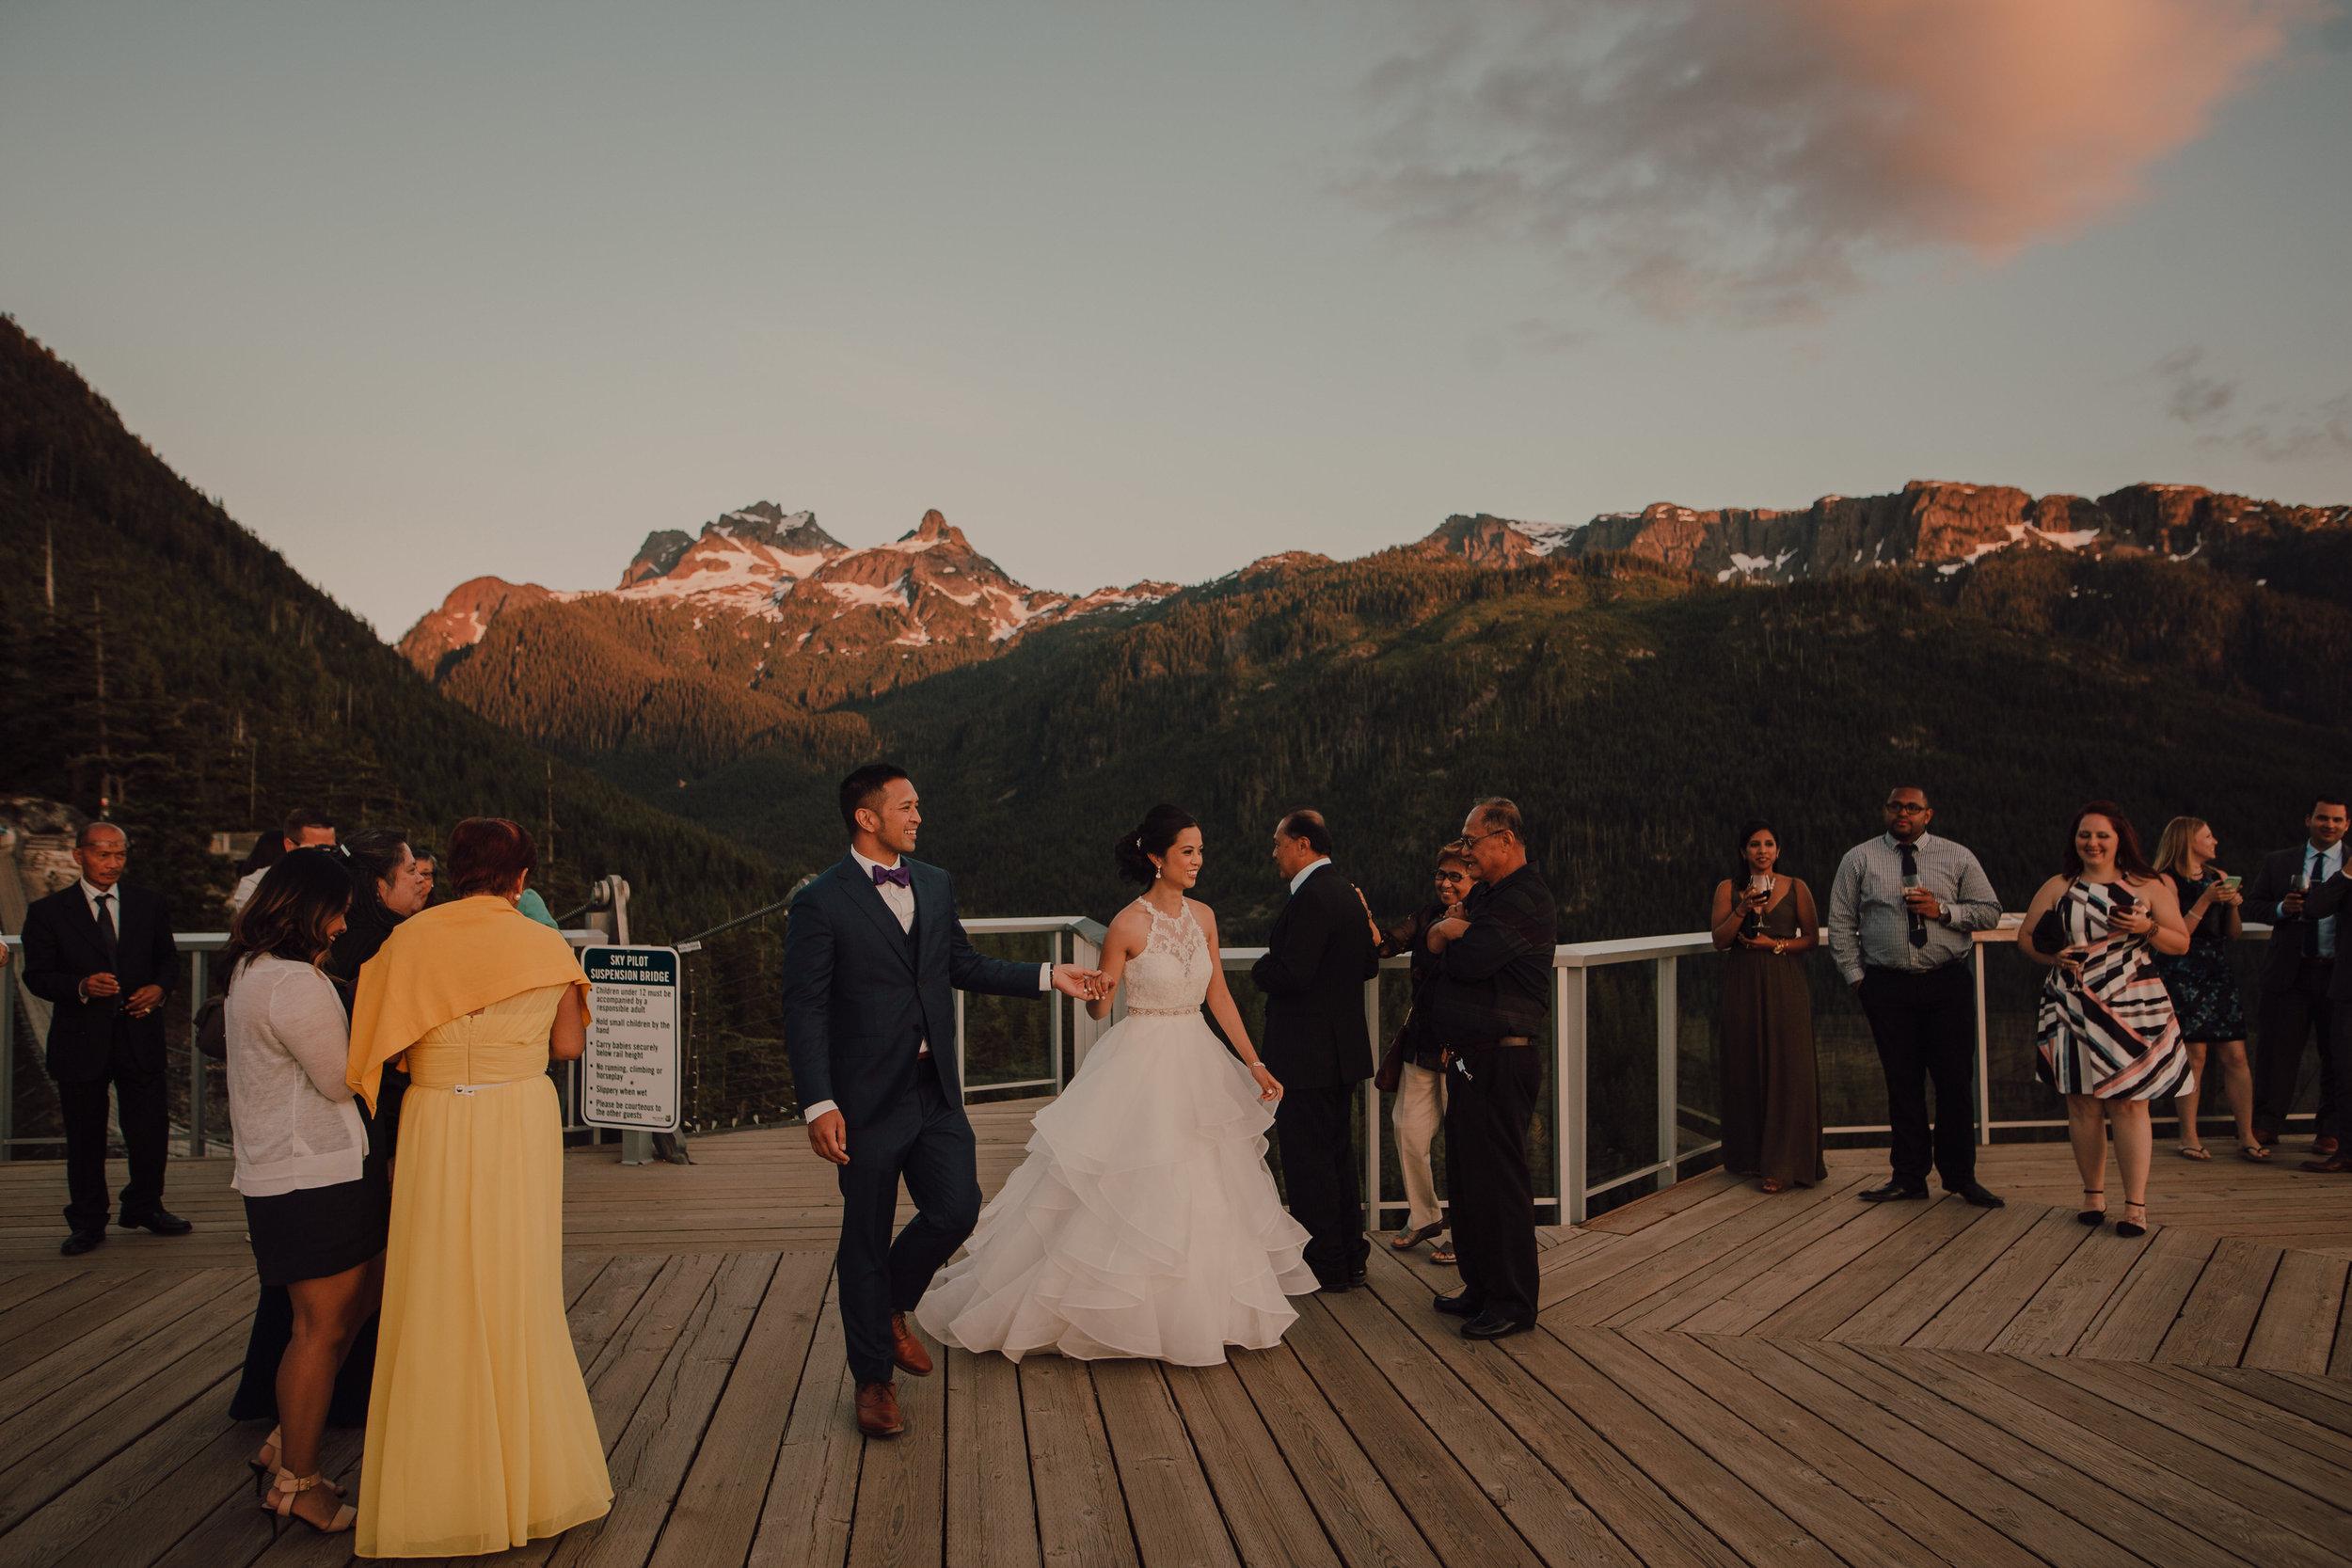 Squamish Wedding Photographer - Sea to Sky Gondola Wedding Photos -  Vancouver Wedding Photographer & Videographer - Sunshine Coast Wedding Photos - Sunshine Coast Wedding Photographer - Jennifer Picard Photography - IMG_5389 (1).jpg